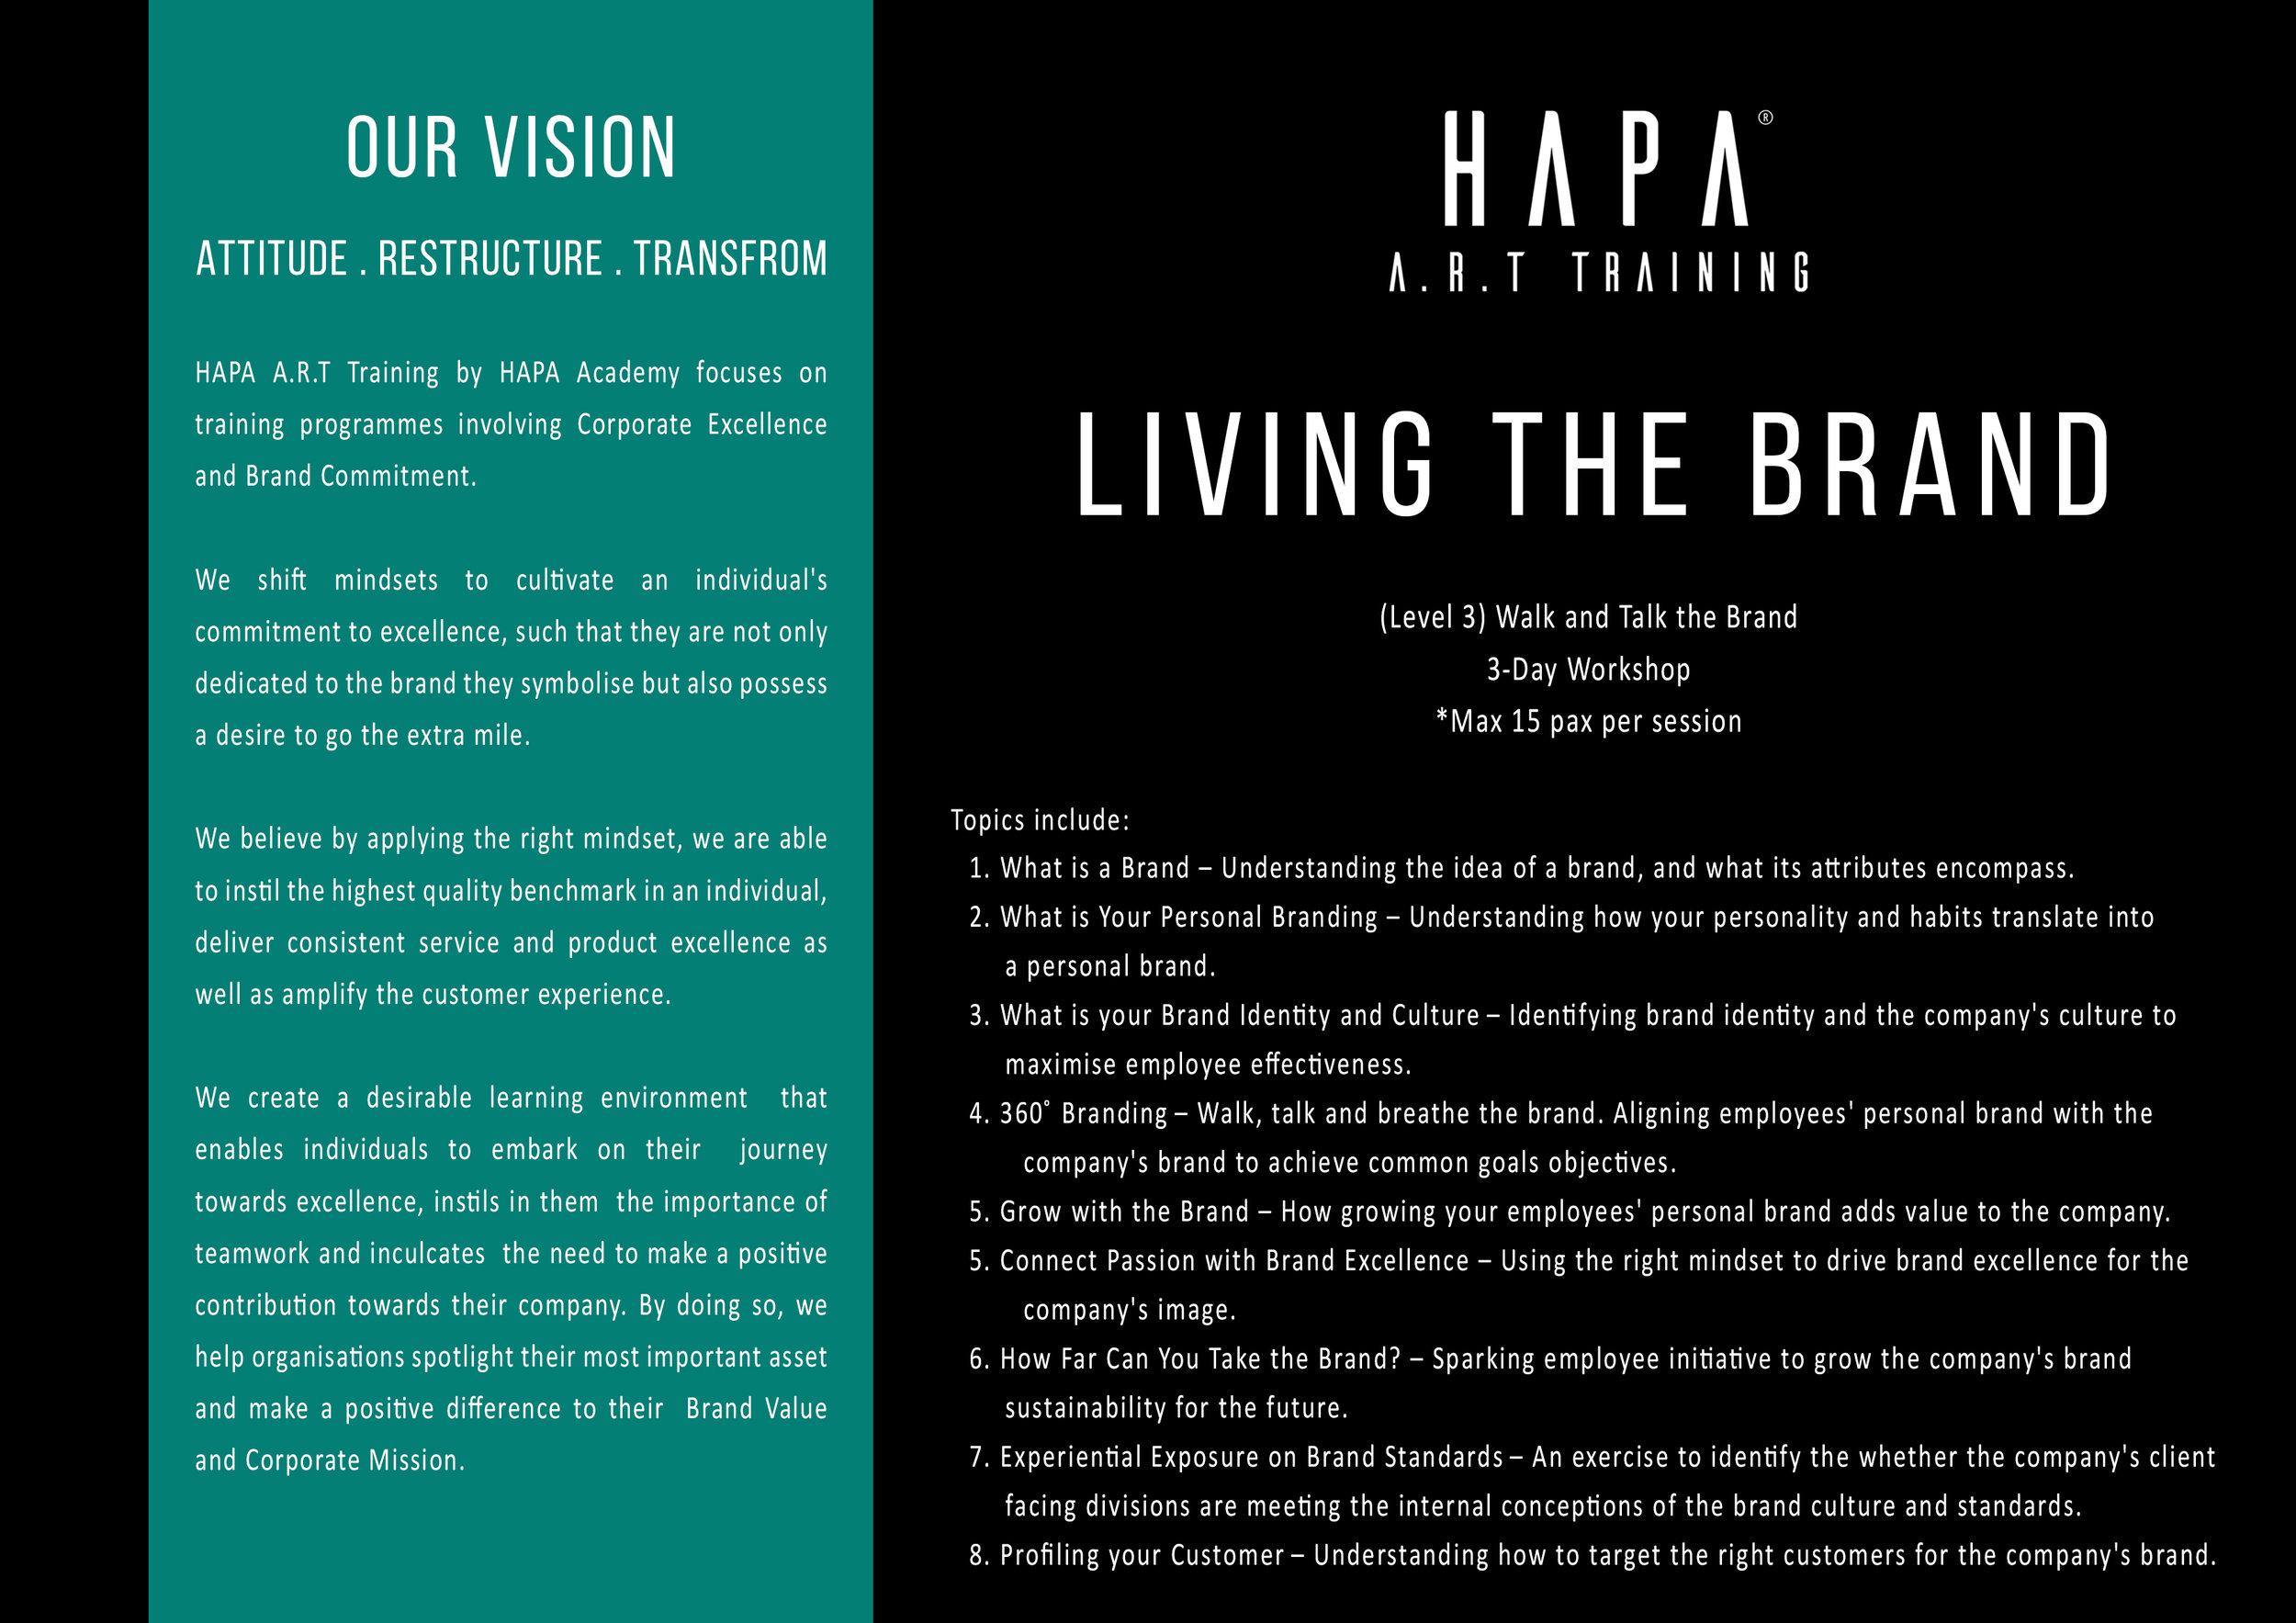 HAPA Academy - HAPA A.R.T TrainingLiving The Brand.jpg